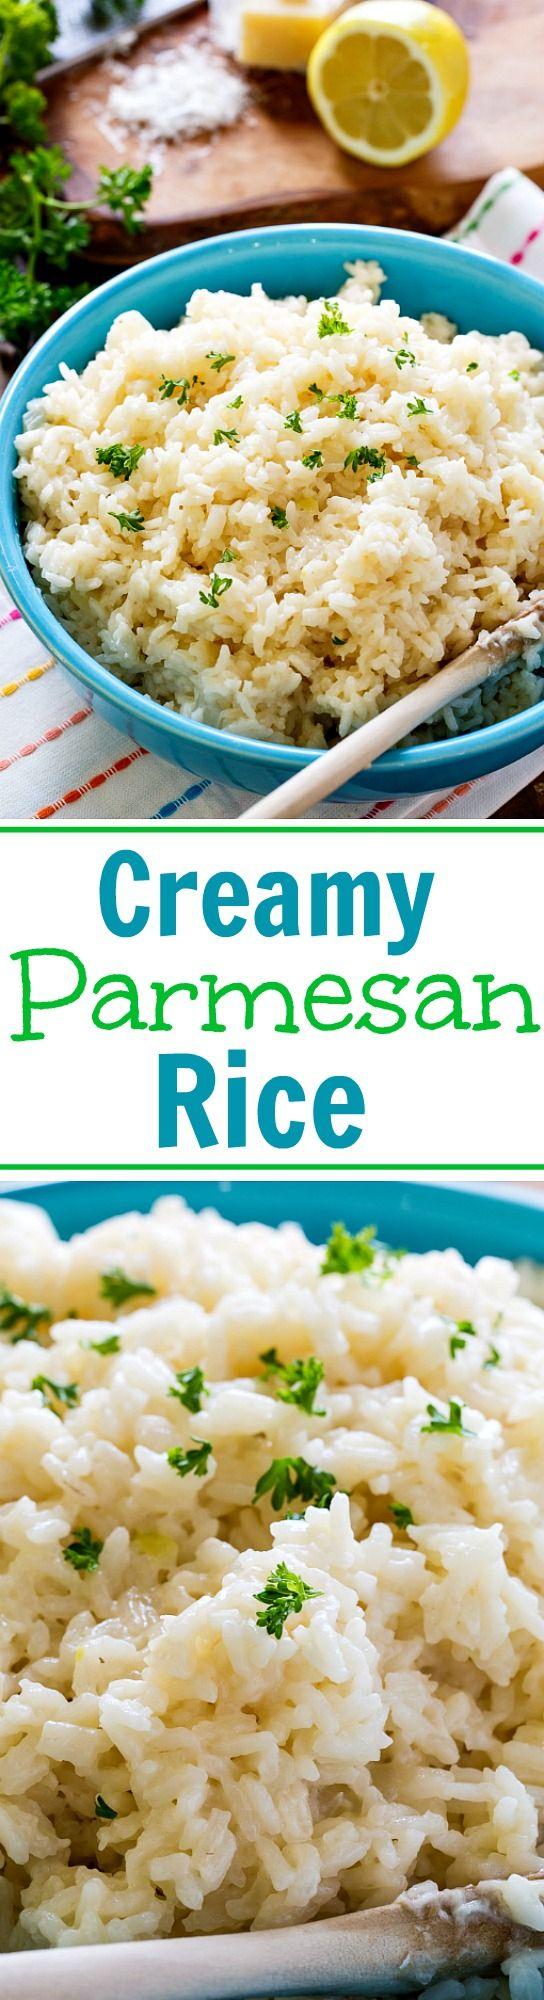 Parmesan Rice | Recipe | Parmesan, Rice and Garlic